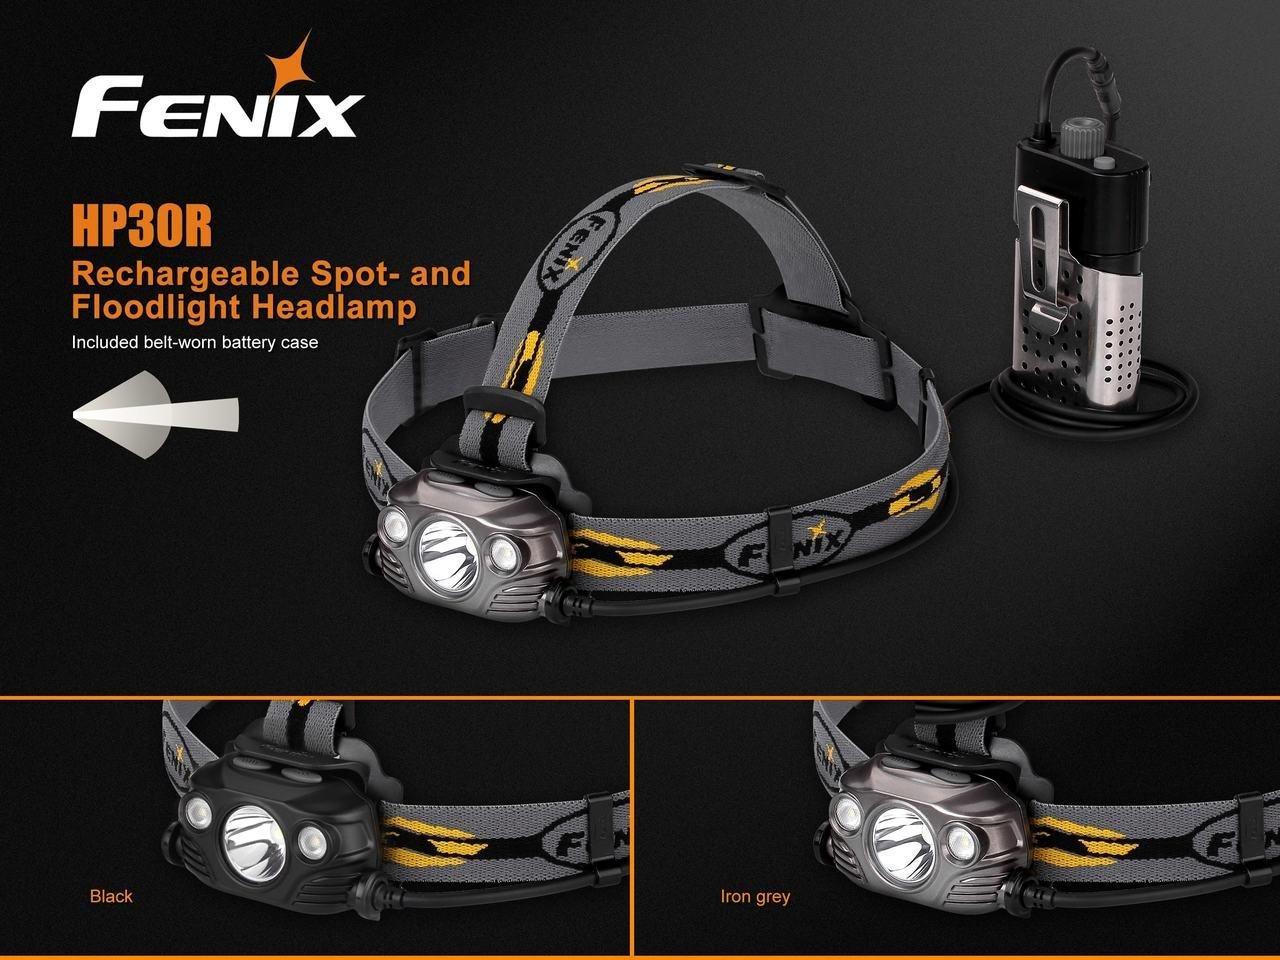 Fenix HP30R 1750 Lumen CREE LED Headlamp (Iron Grey) with 2 X Fenix 18650 Li-ion rechargeable batteries and Four EdisonBright CR123A Lithium batteries bundle by Fenix (Image #3)